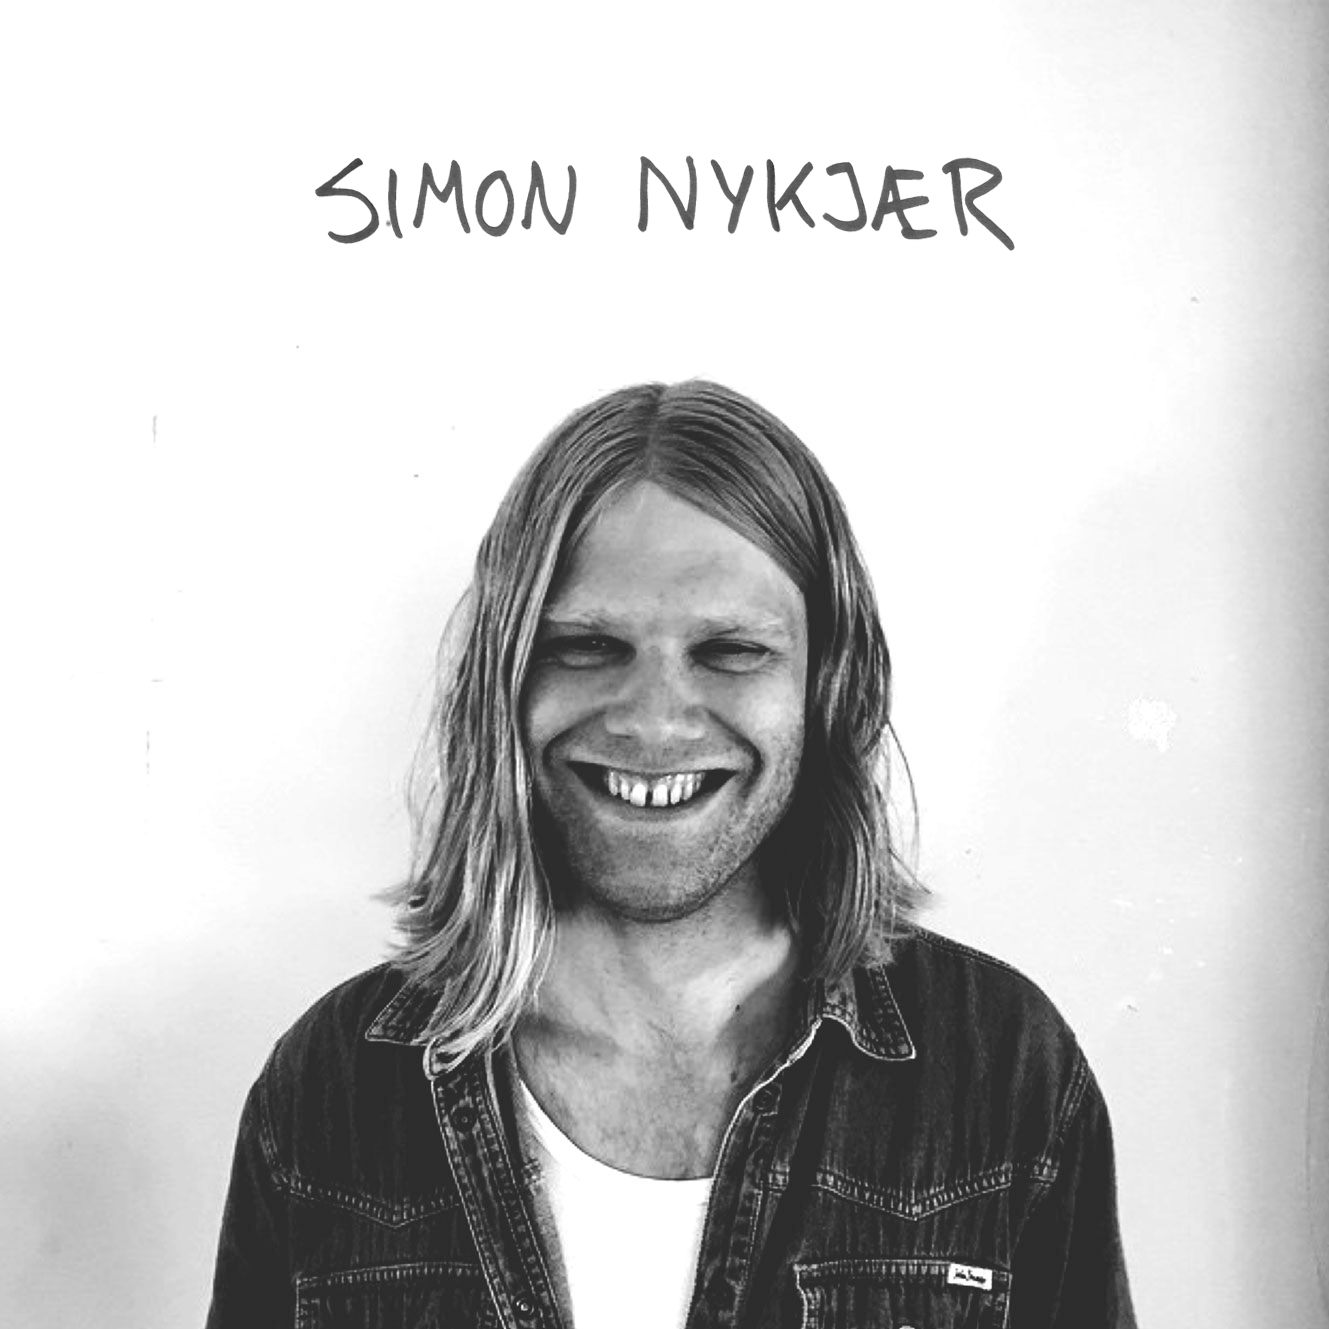 SIMON NYKJÆR